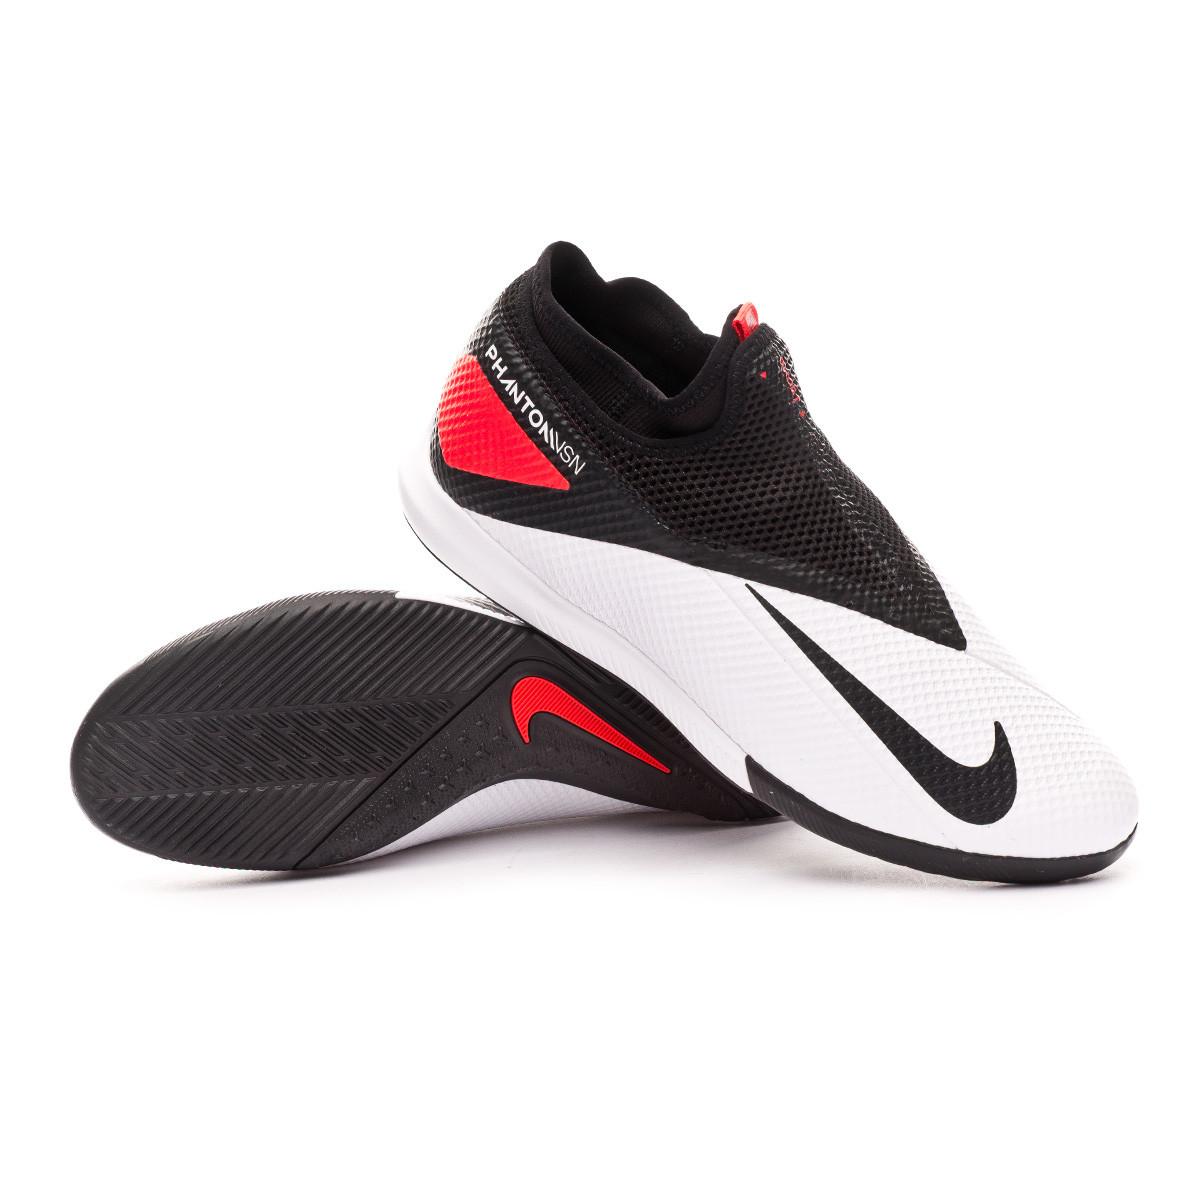 Chaussure de futsal Nike Phantom Vision II Academy DF IC